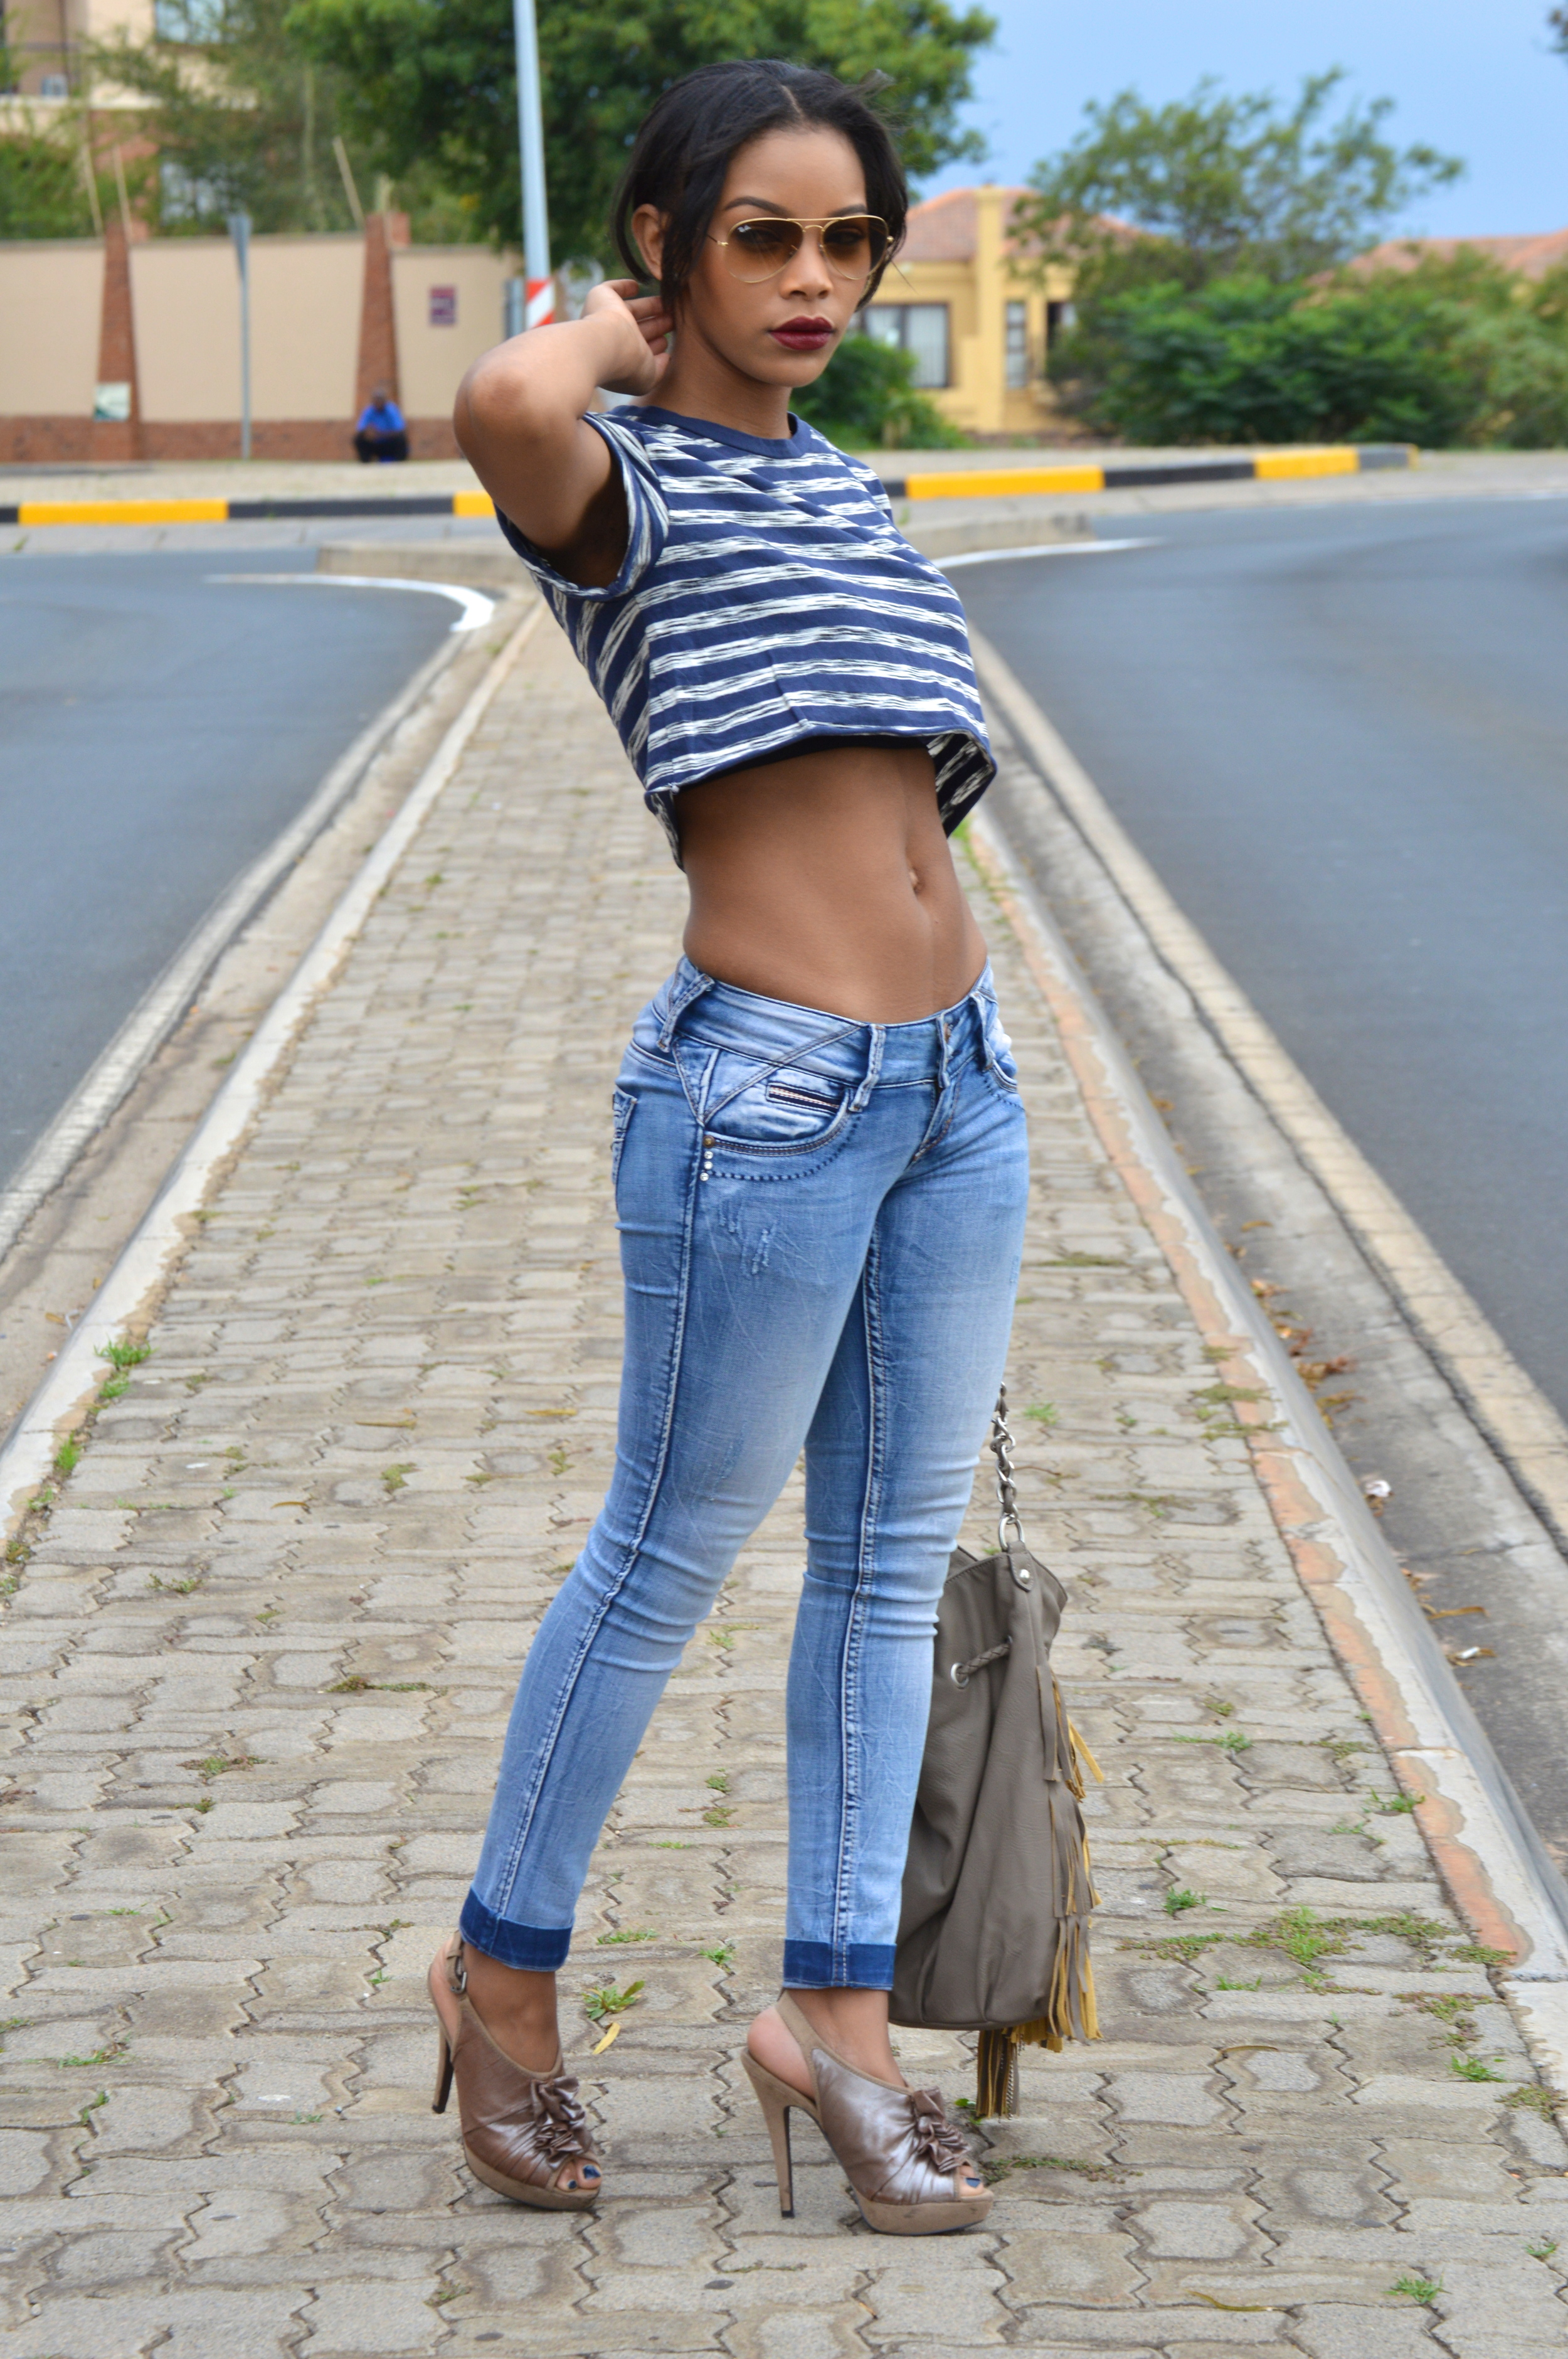 Kaylista_jeans5